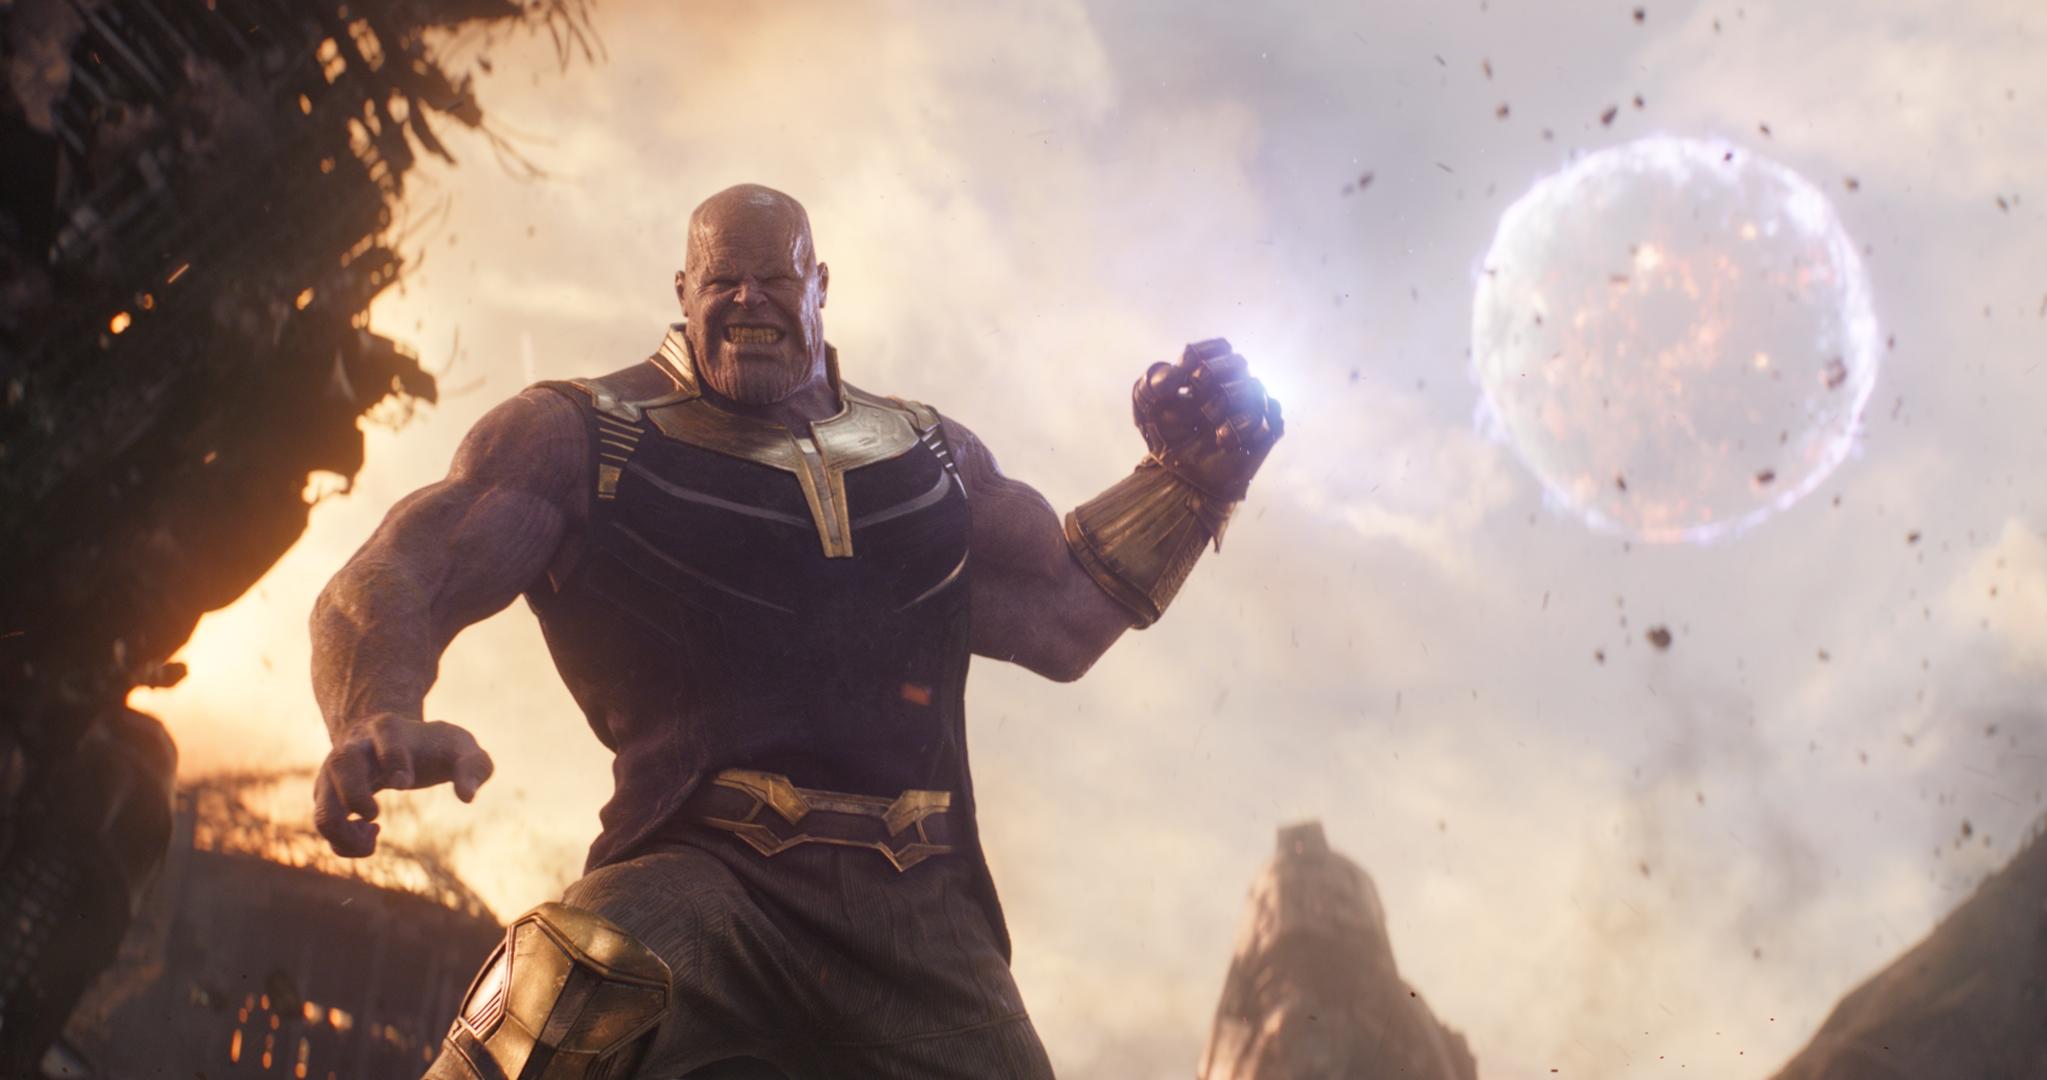 39. Avengers Infinity War